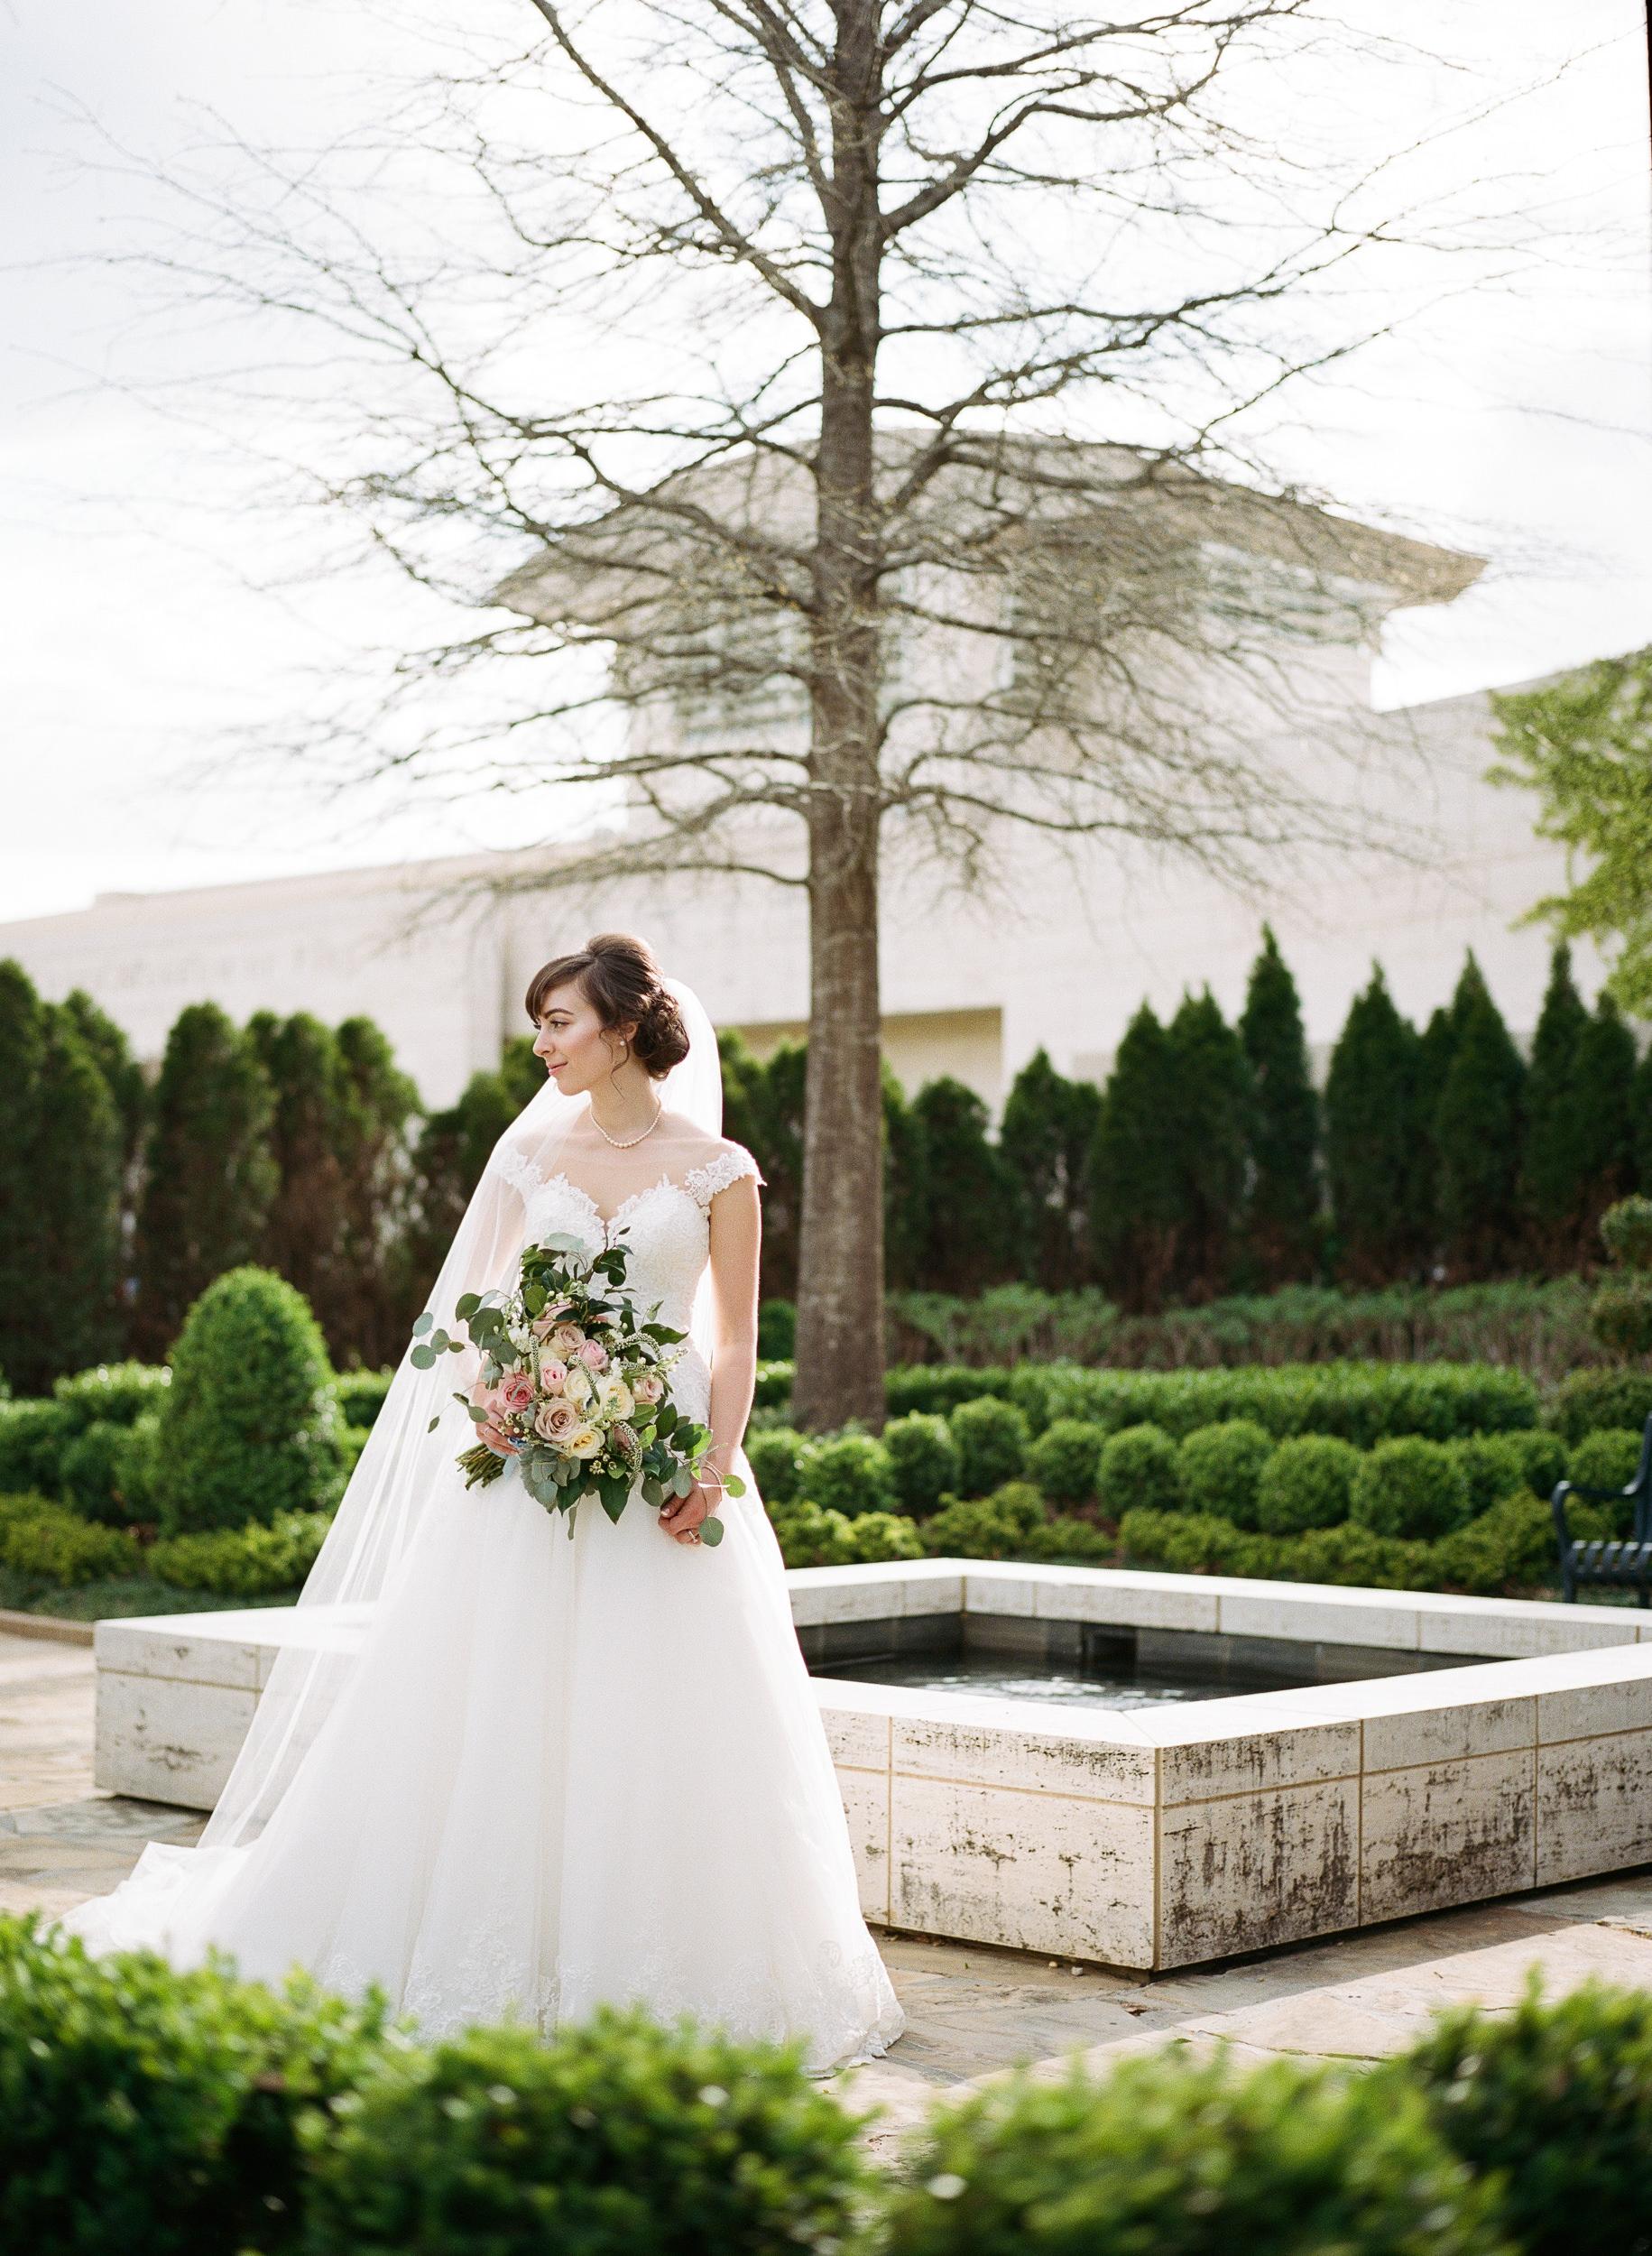 AB_Auburn_Wedding_2019-00055.jpg